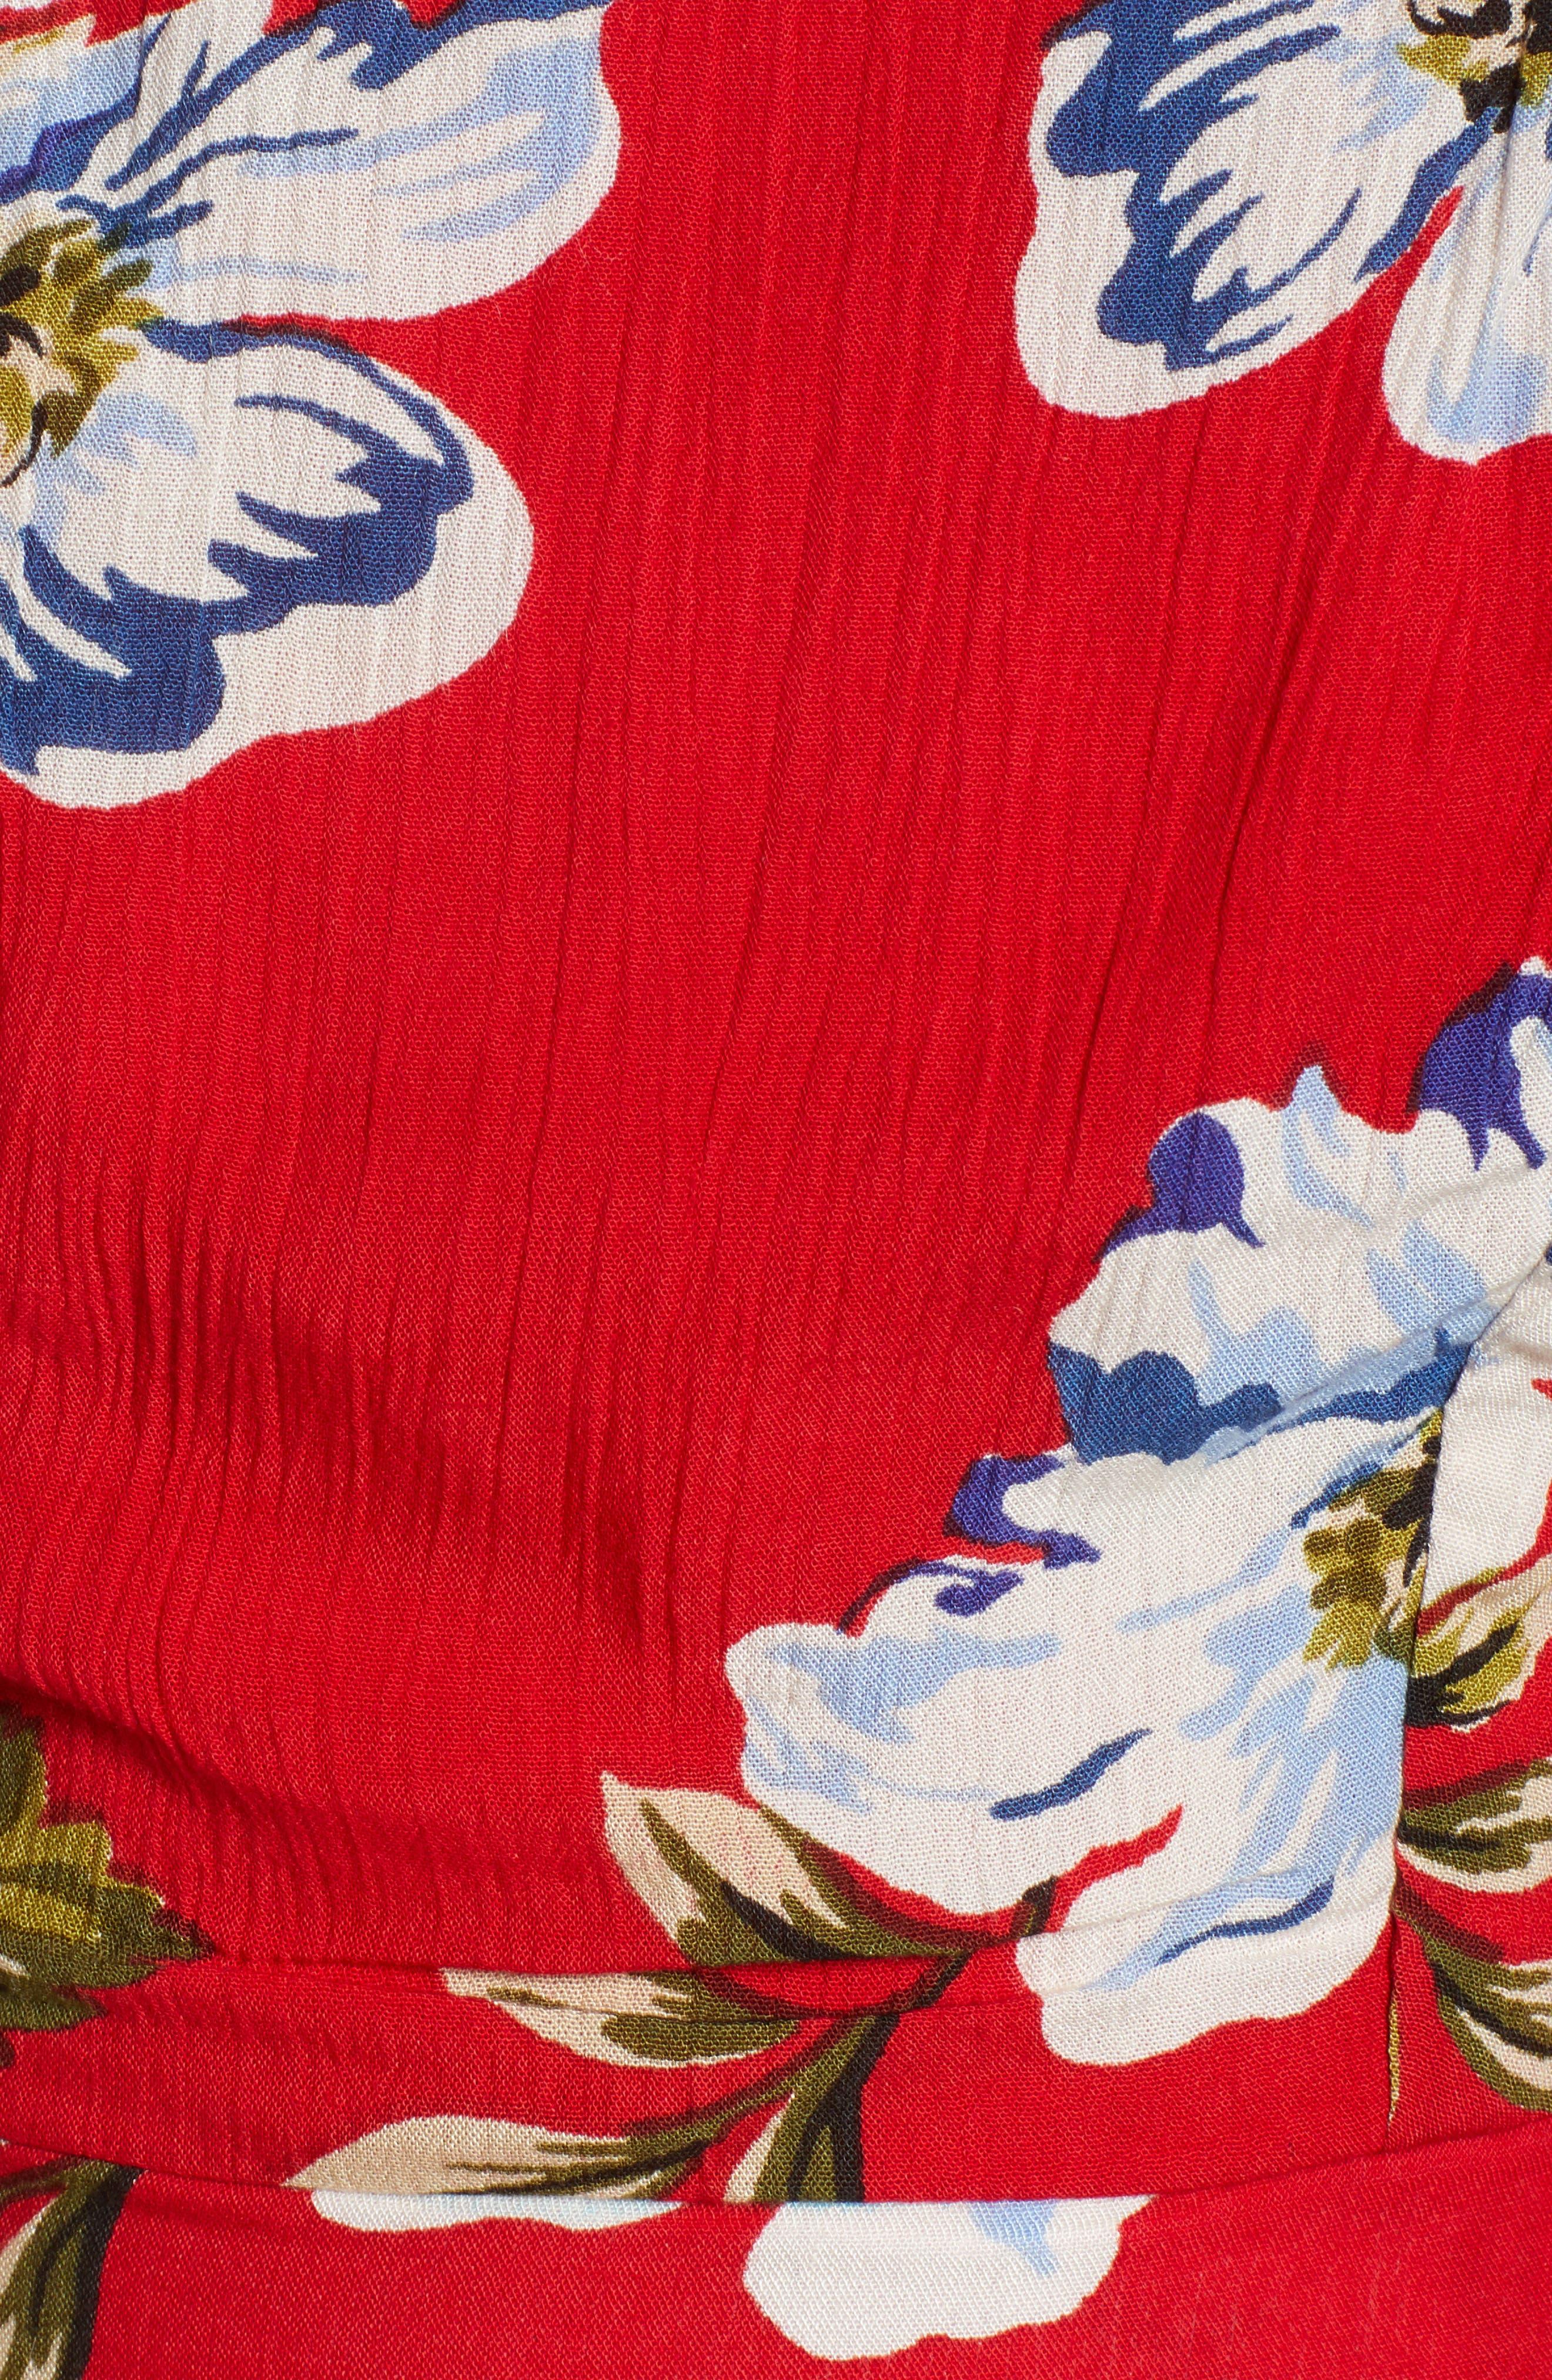 Blue Moon Floral Off the Shoulder Crop Top,                             Alternate thumbnail 6, color,                             600